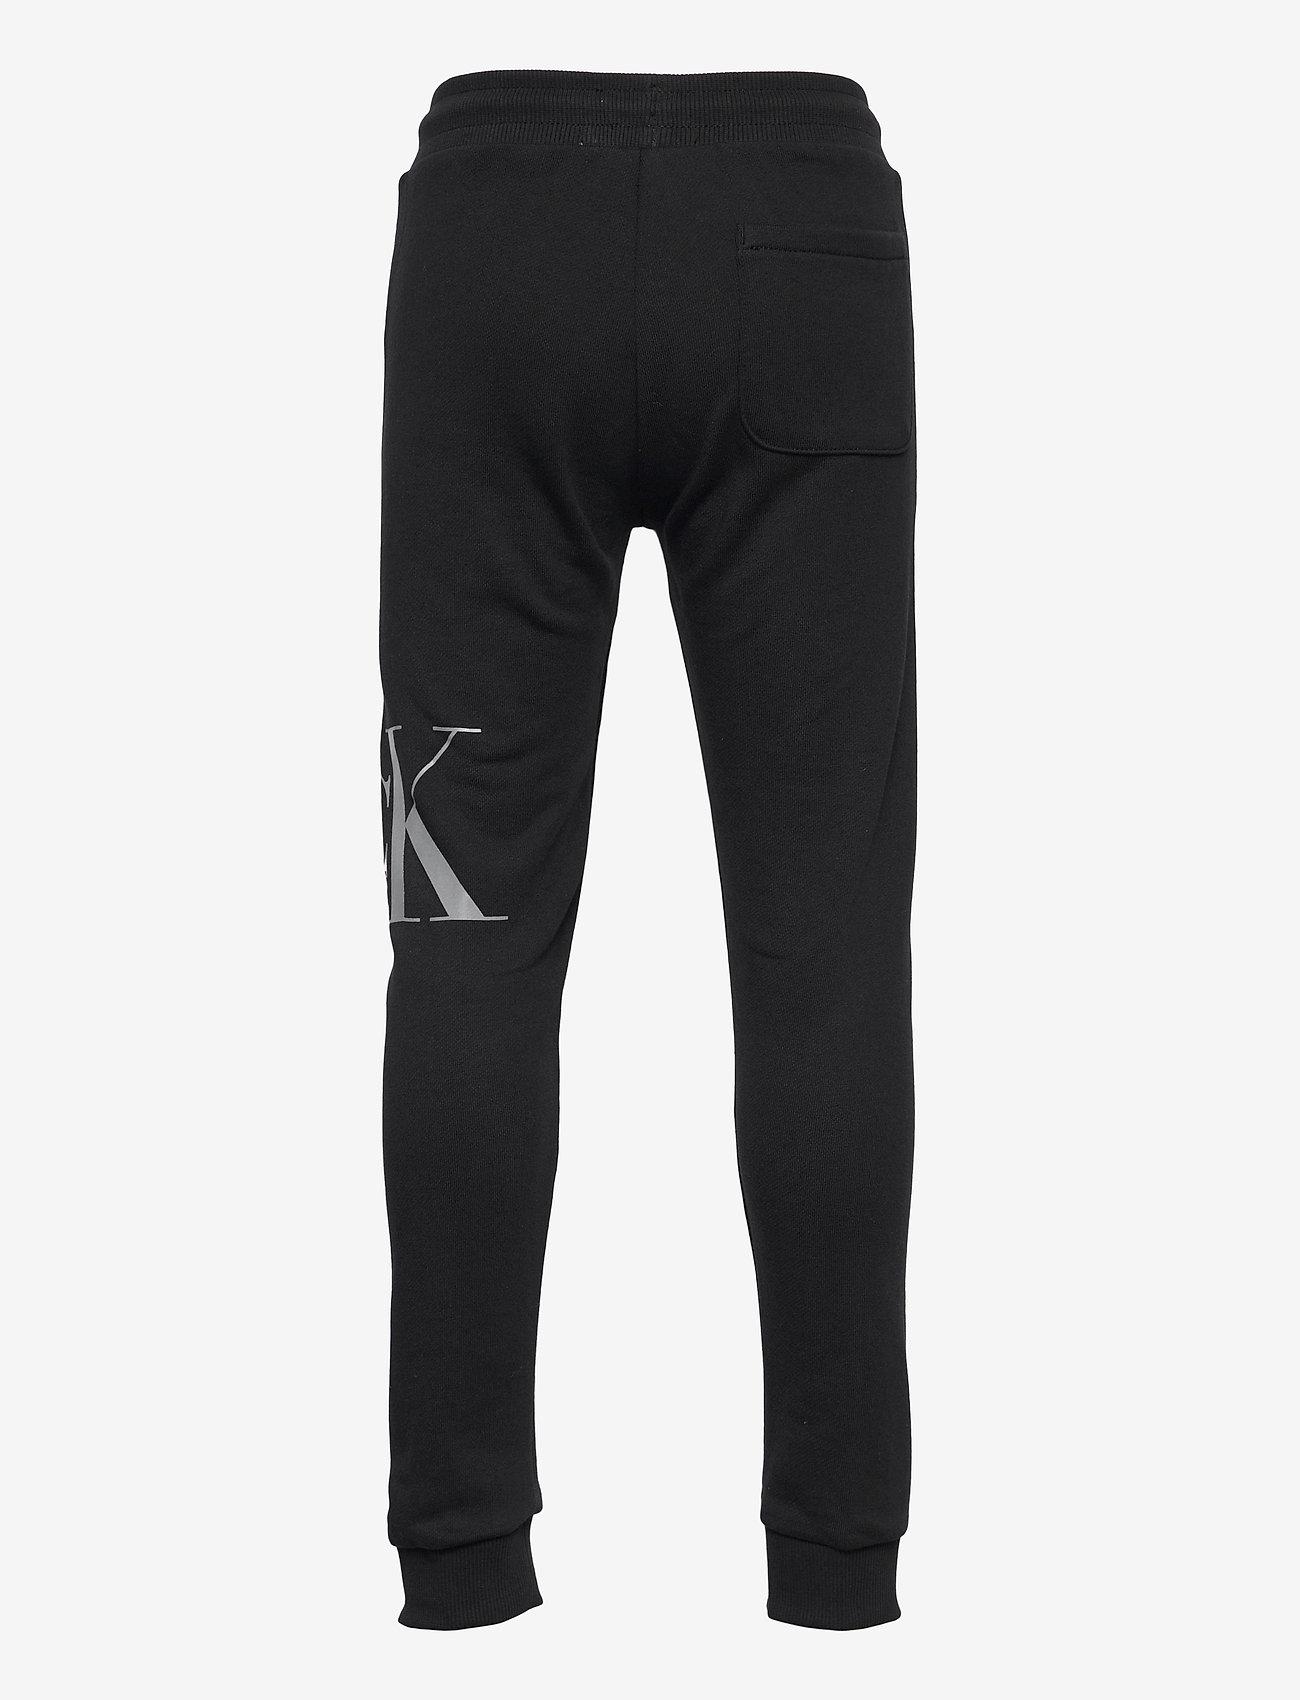 Calvin Klein - HYBRID LOGO SWEATPANTS - jogginghosen - ck black - 1